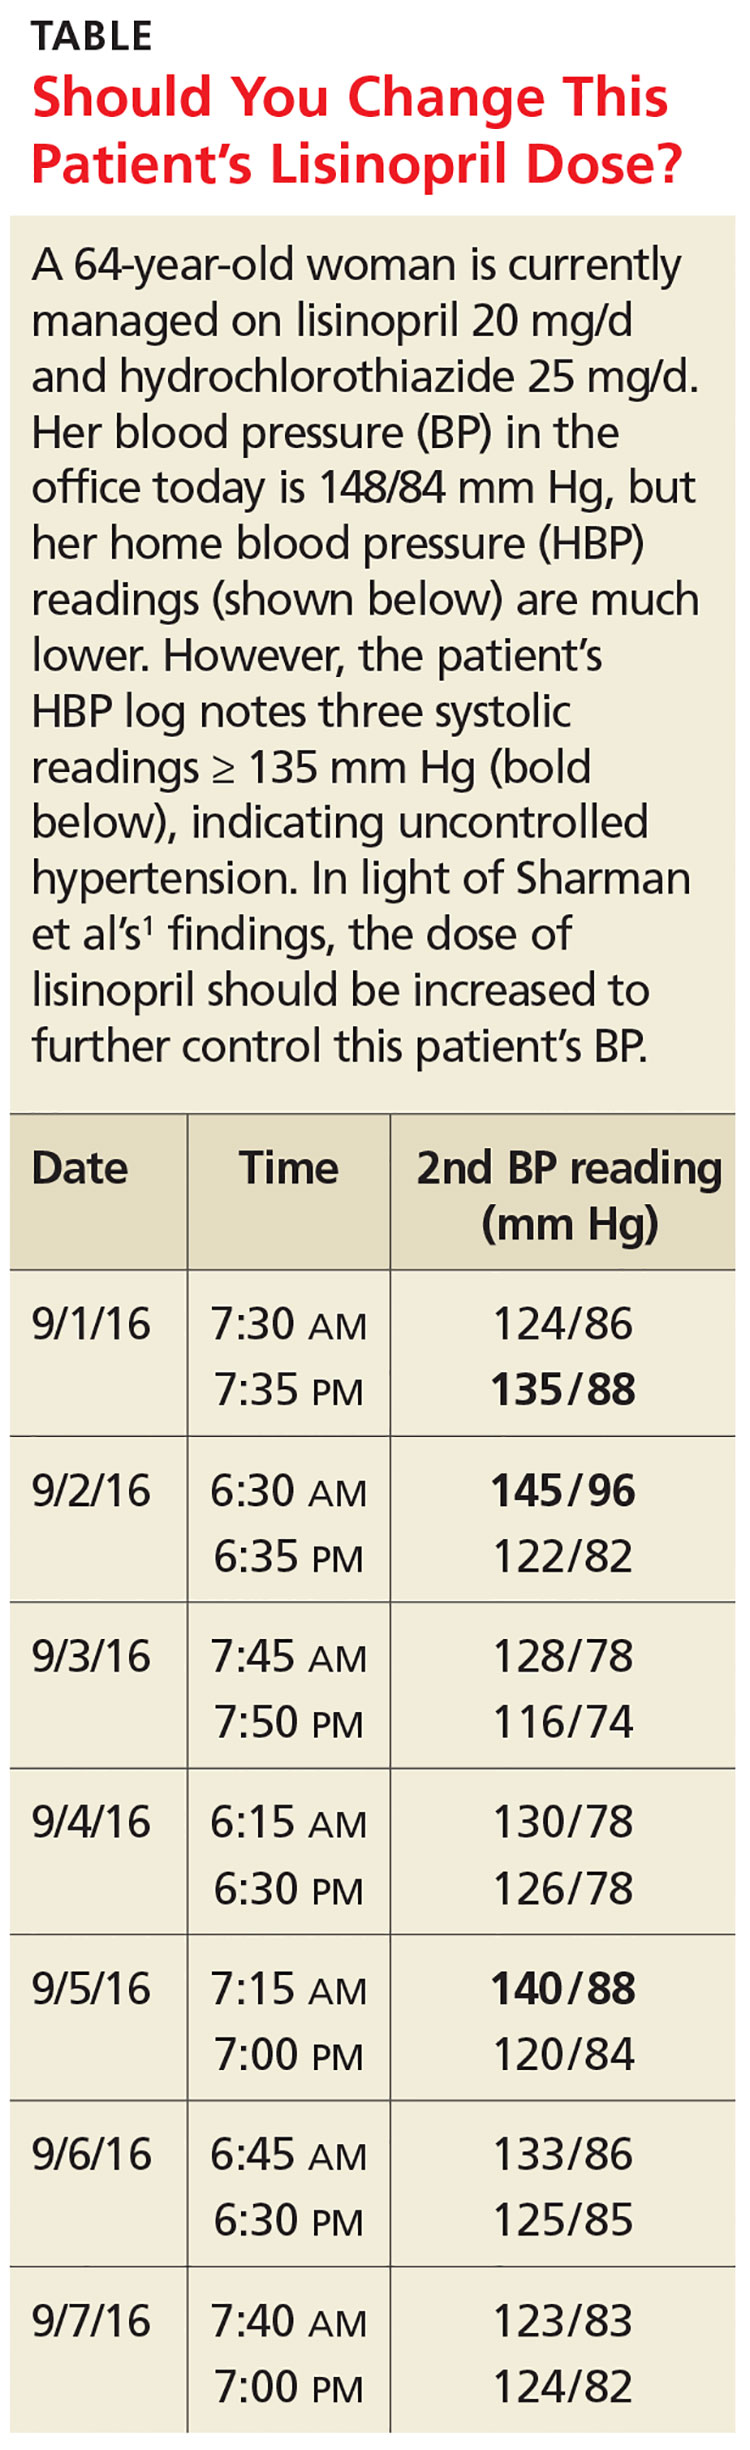 Should You Change This Patient's Lisinopril Dose image